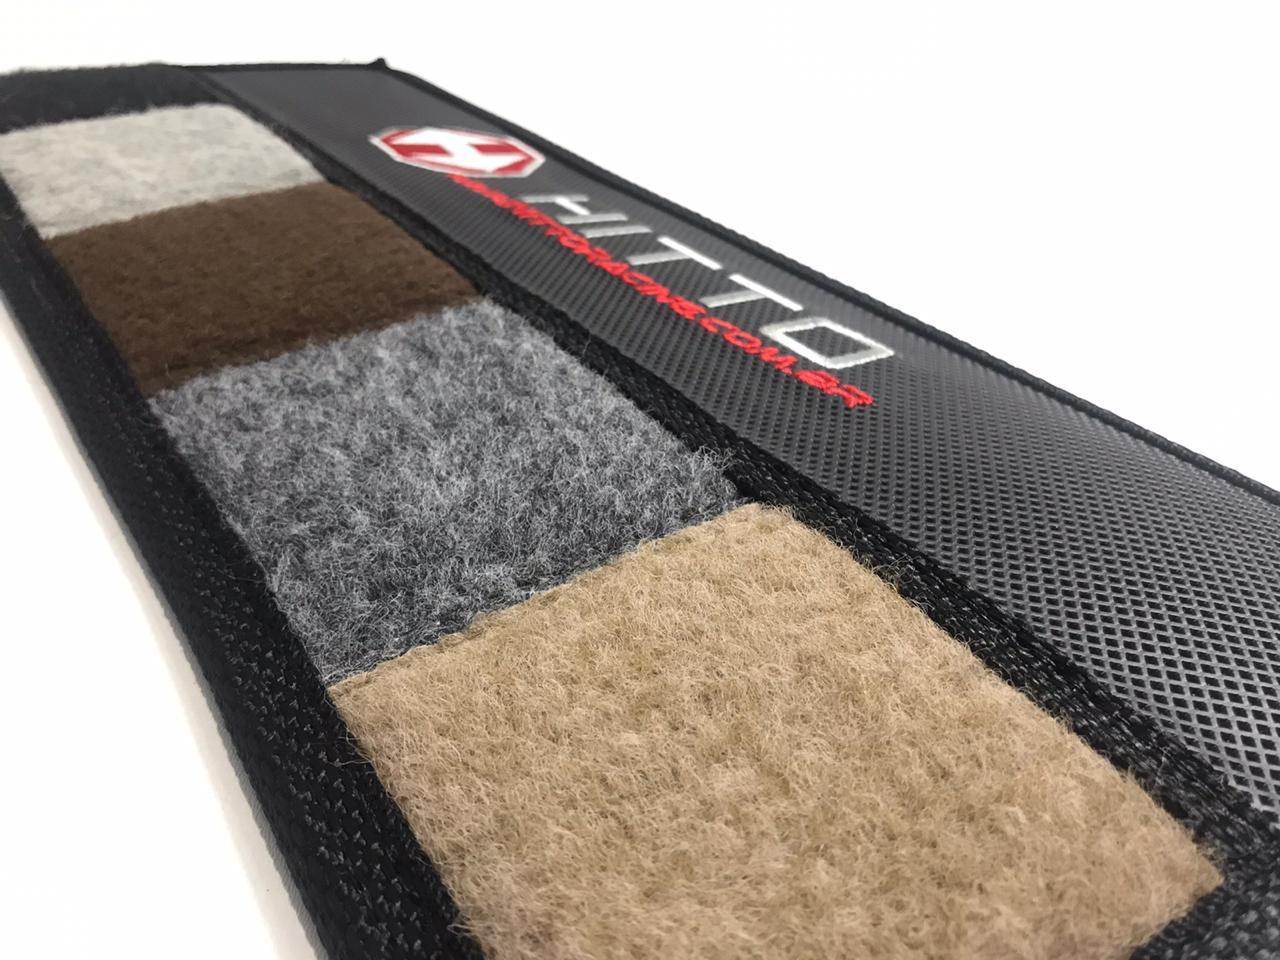 Tapete Blazer Carpete Luxo Base Pinada Hitto O Melhor!